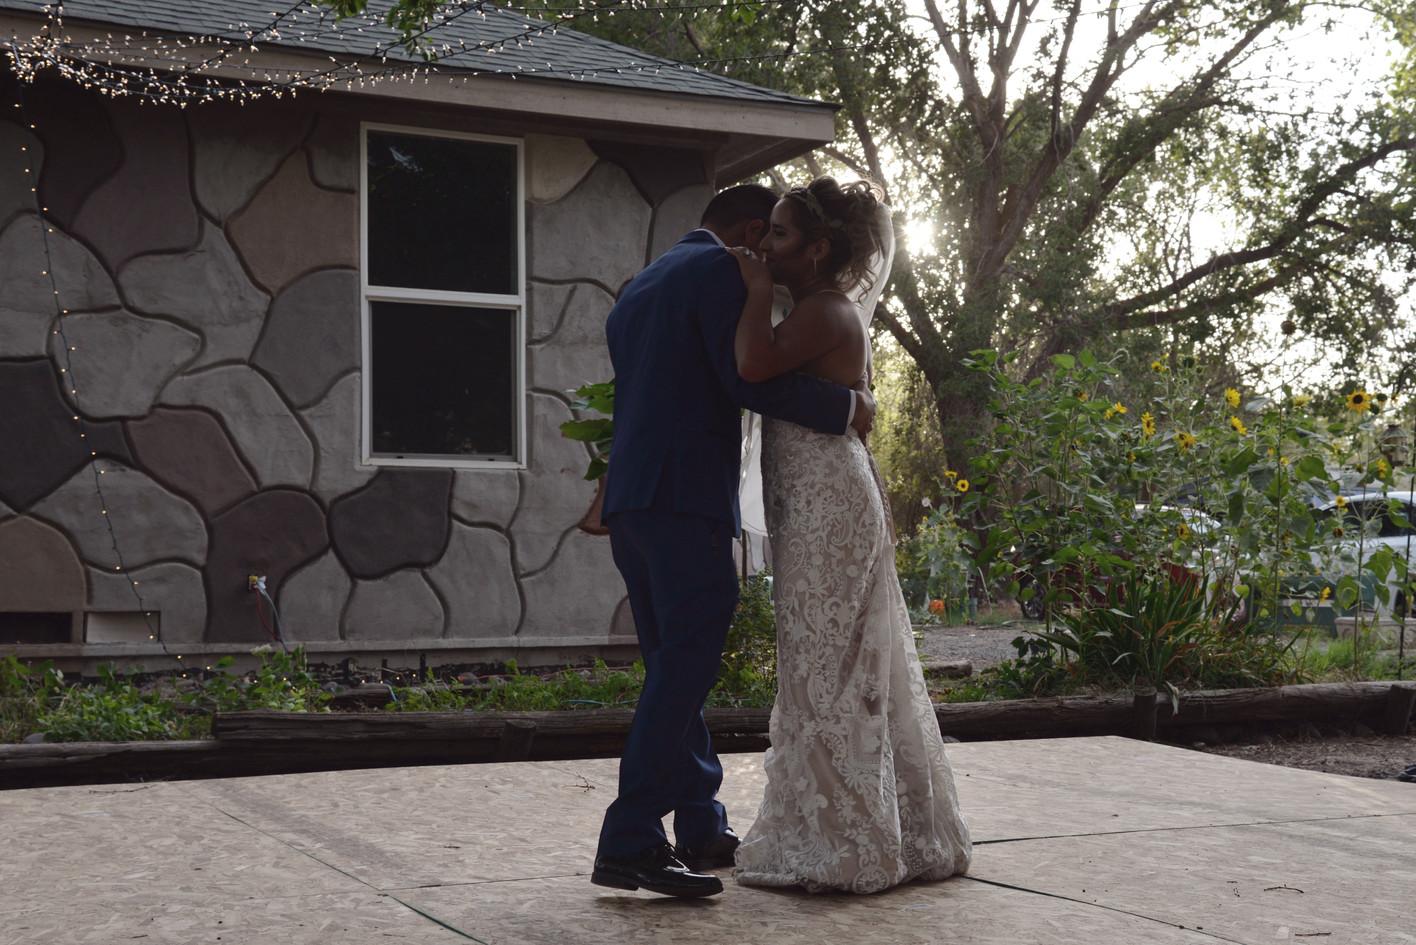 DSC_2373 copy wedding photographer yakima EDITED NO LOGO.jpg